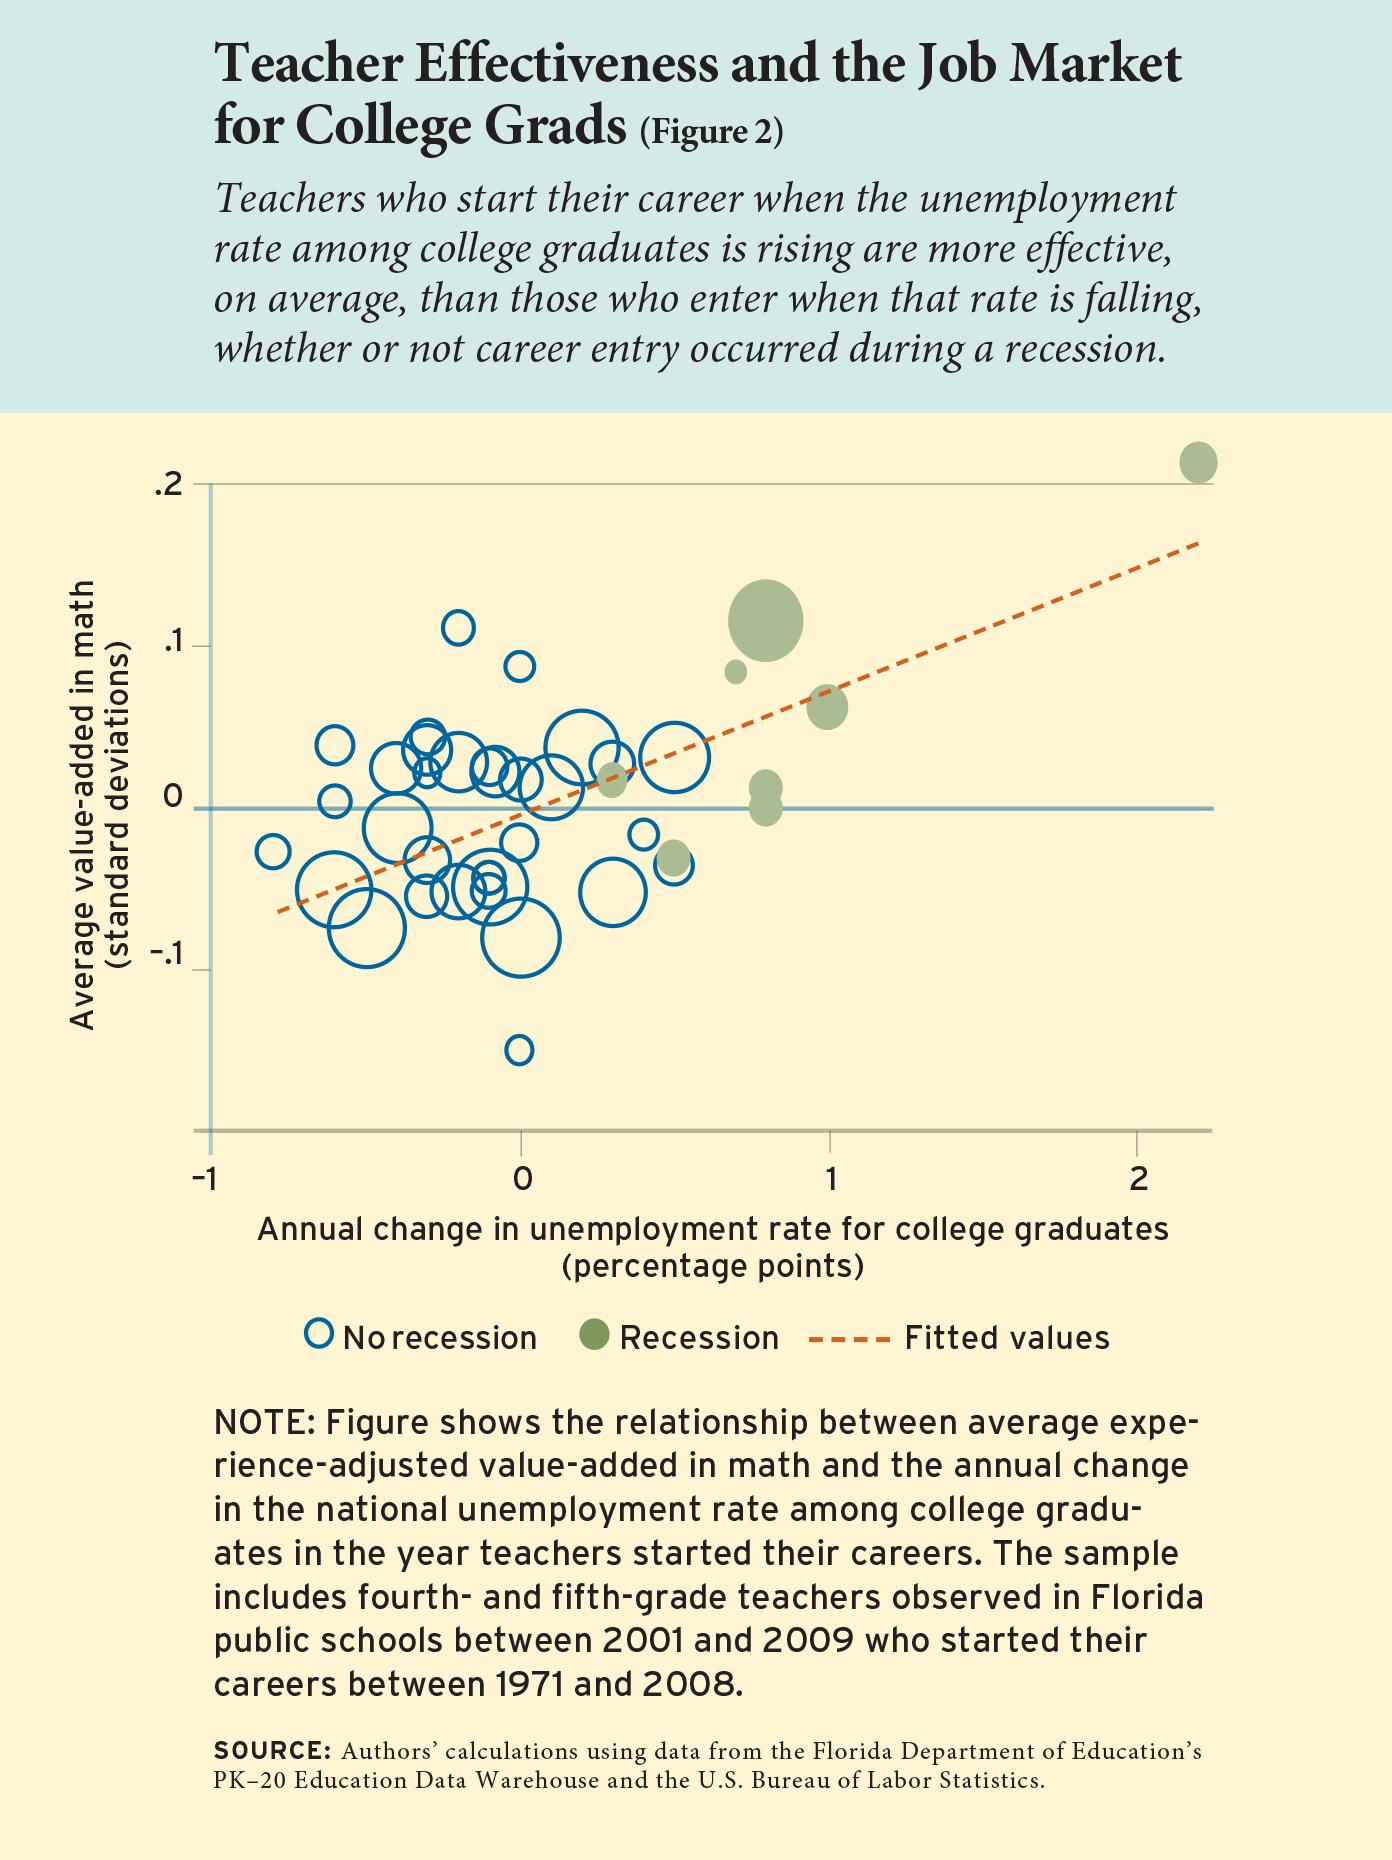 Figure 2: Teacher Effectiveness and the Job Market for College Grads